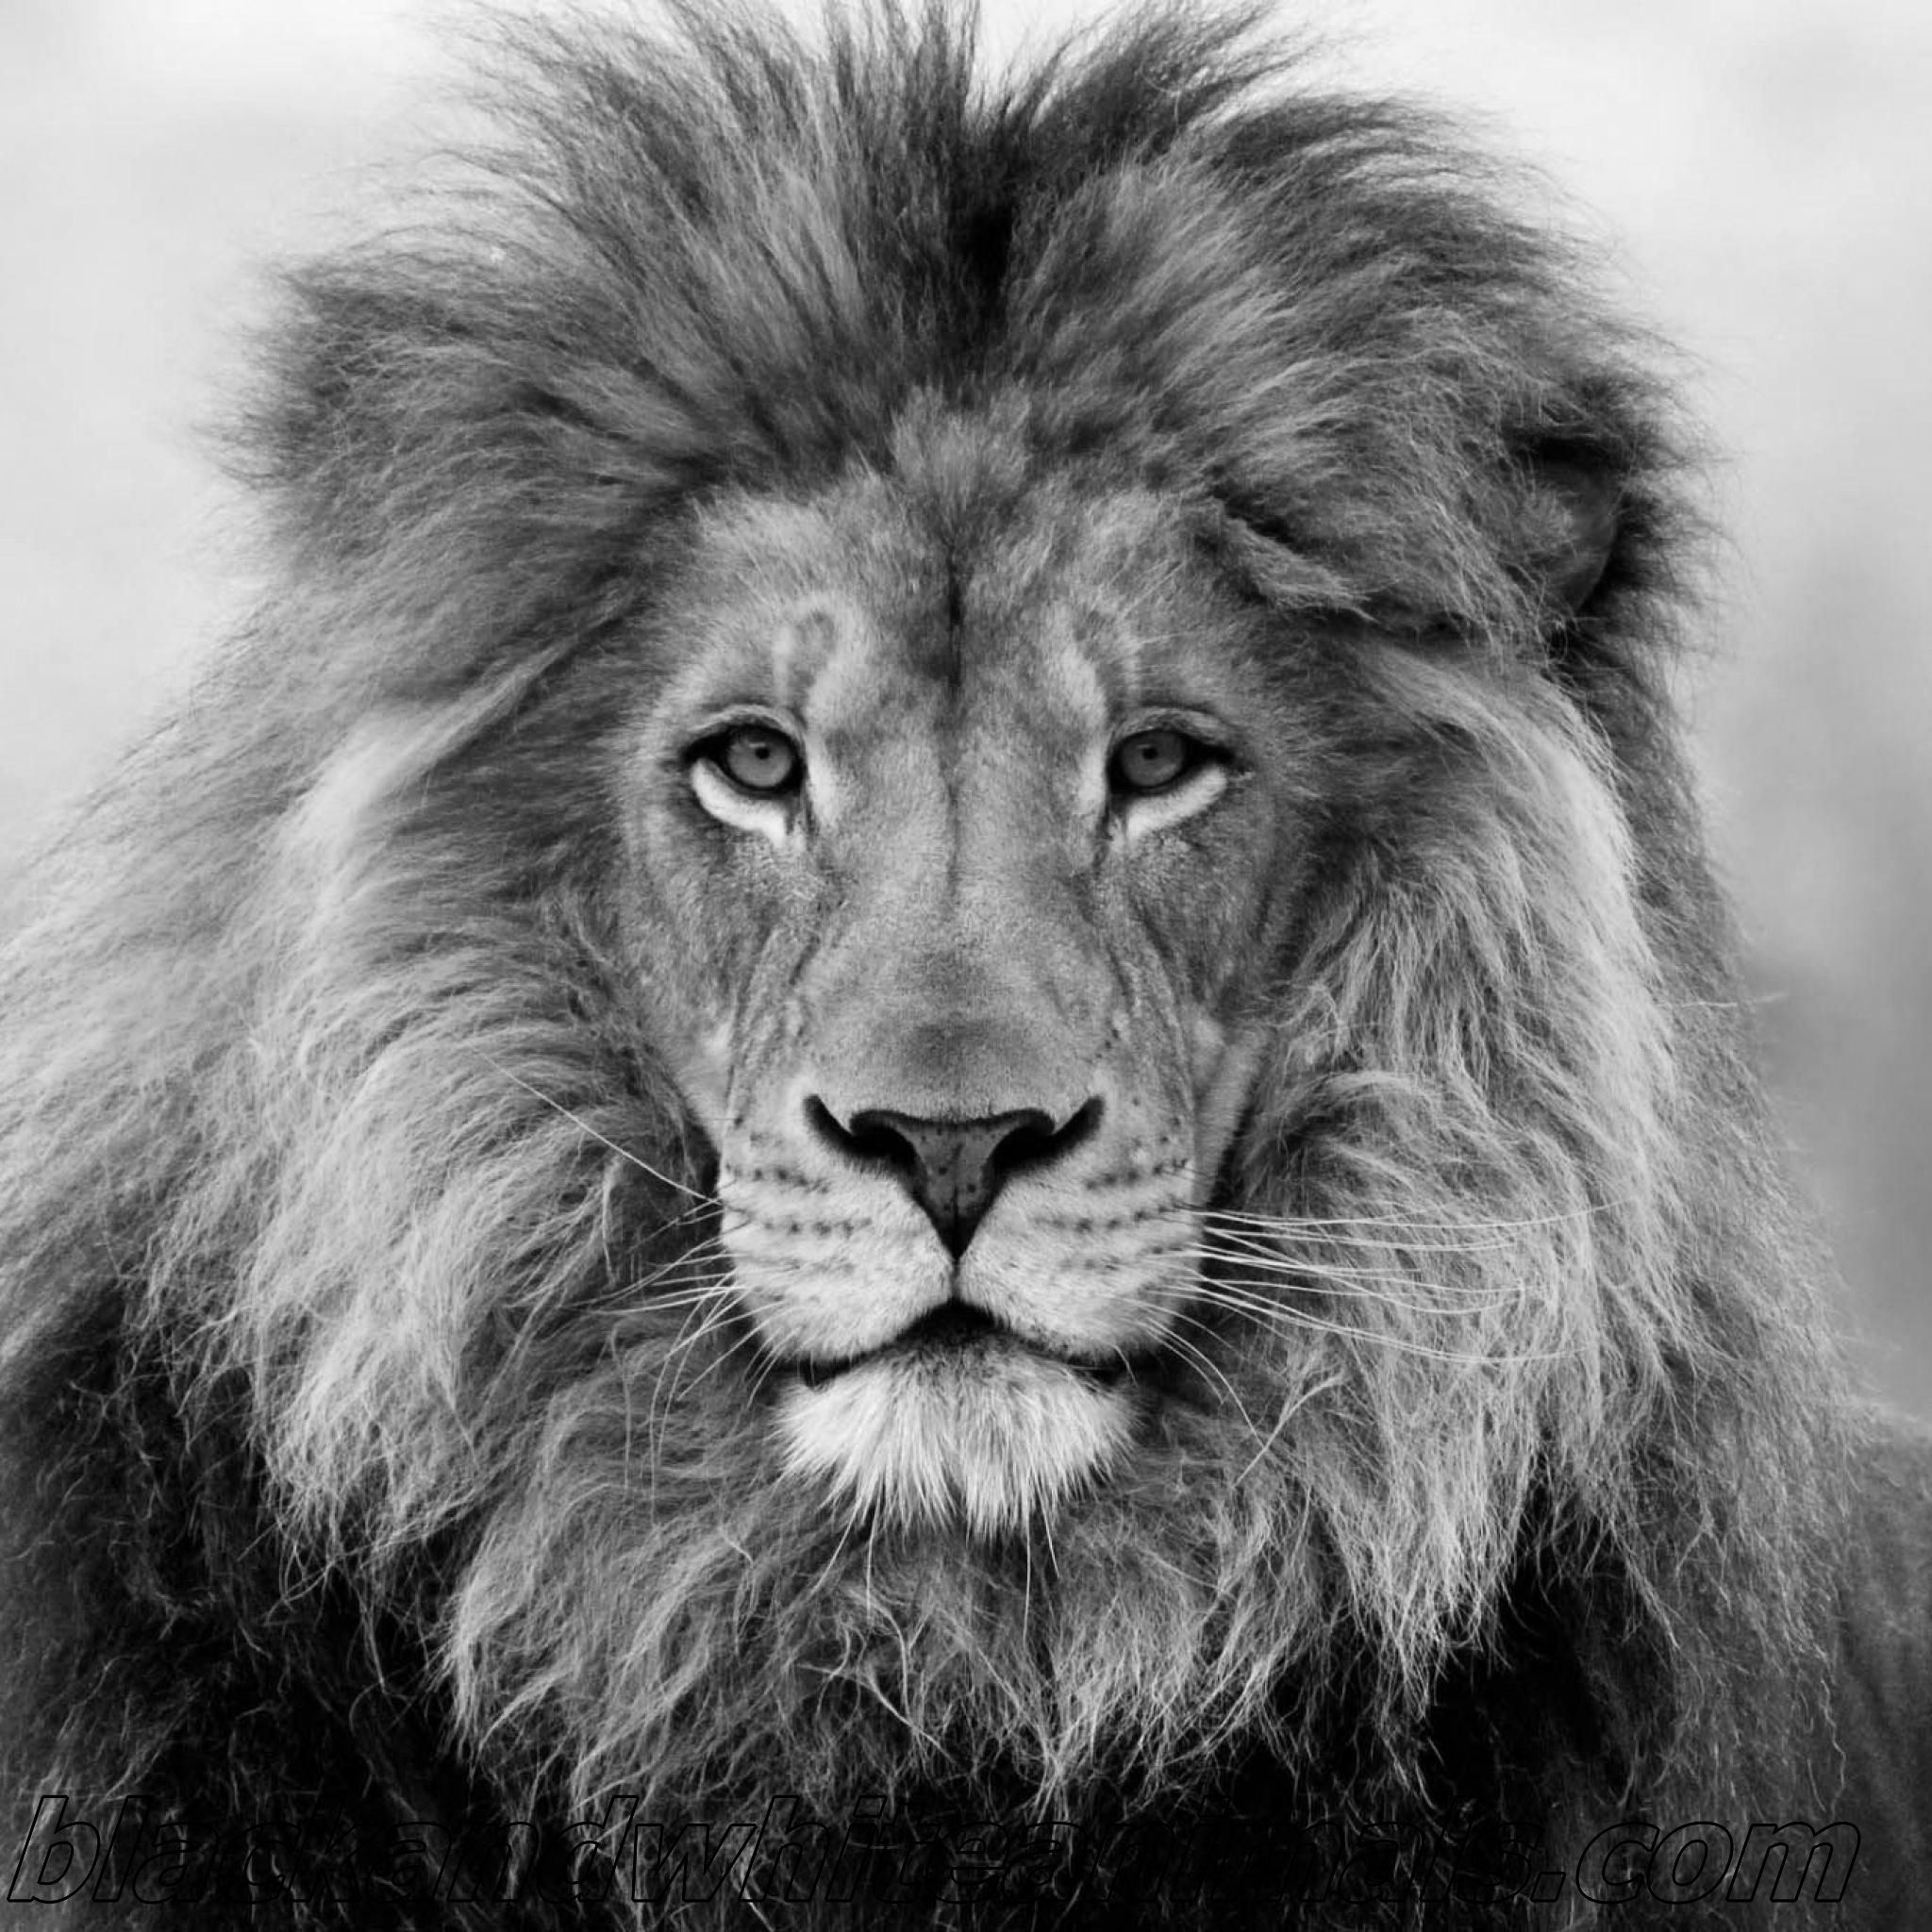 desktop-black-and-white-photos-of-animals-wallpaper